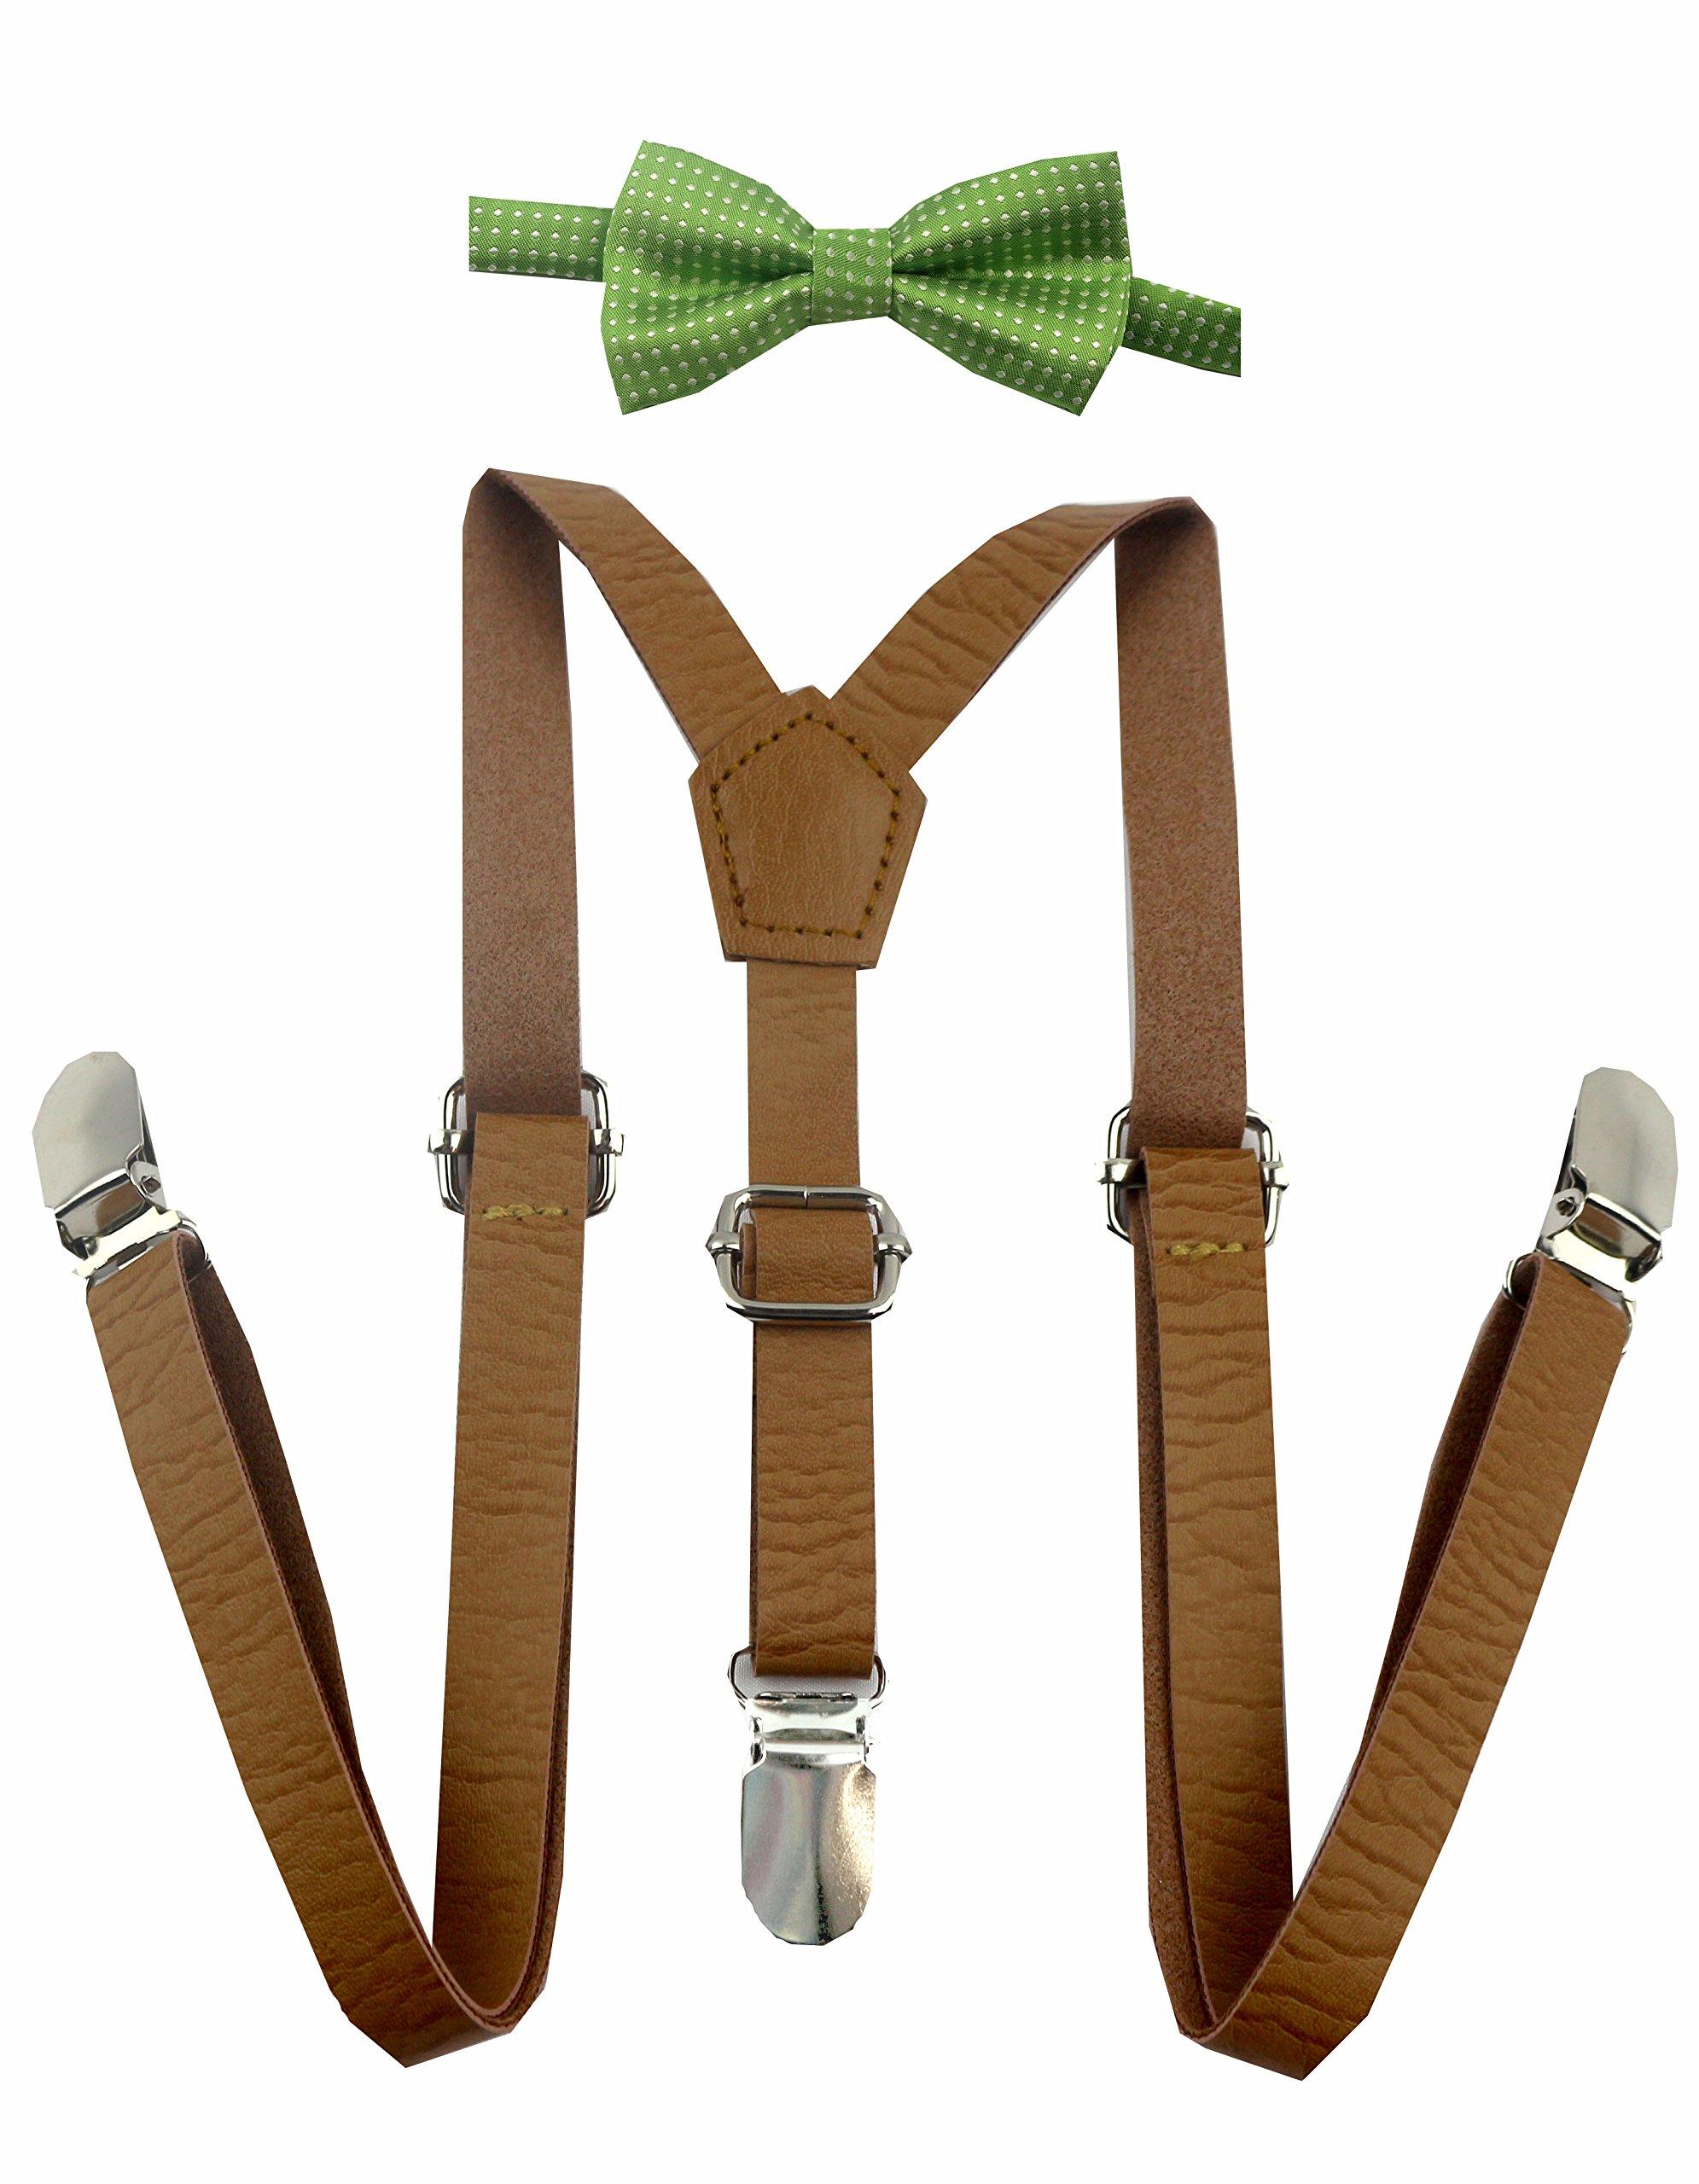 Skinny Leather Suspenders for Baby, Toddler, and Children (Light Green White Polka Dot Bow)